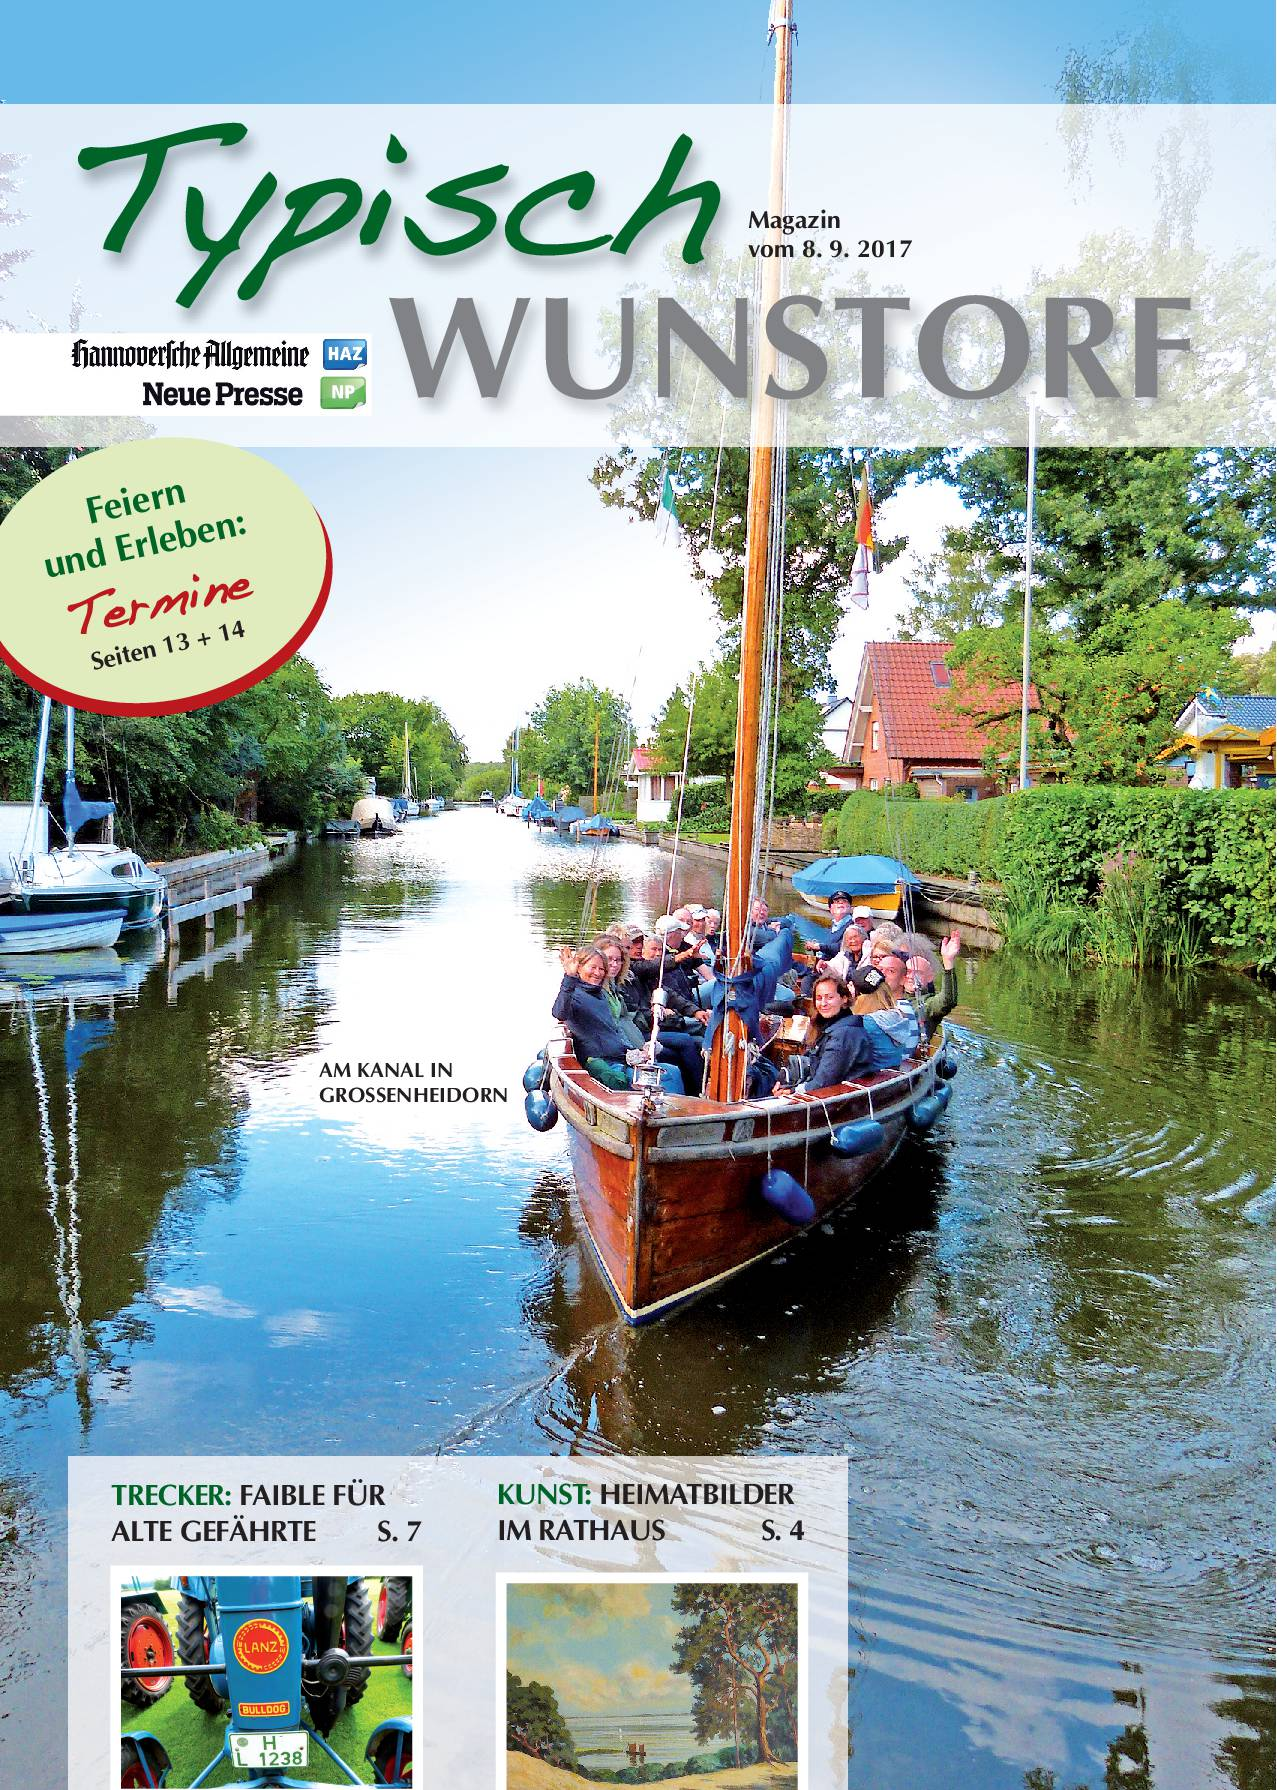 wunstorf-nr-3-vom-08-09-2017